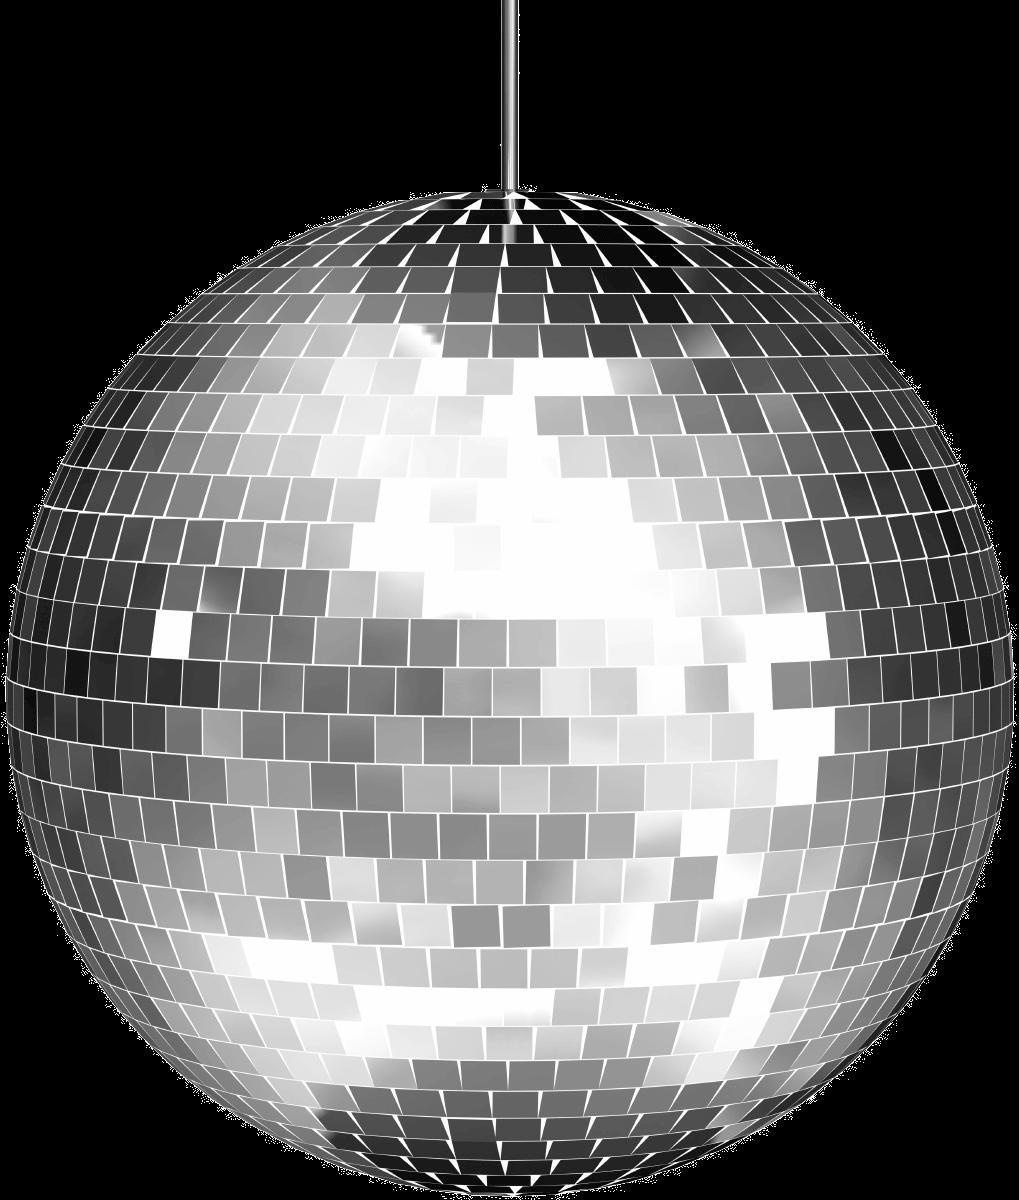 Ball silver metallic ftestickersfreetoedit. Disco clipart disco party